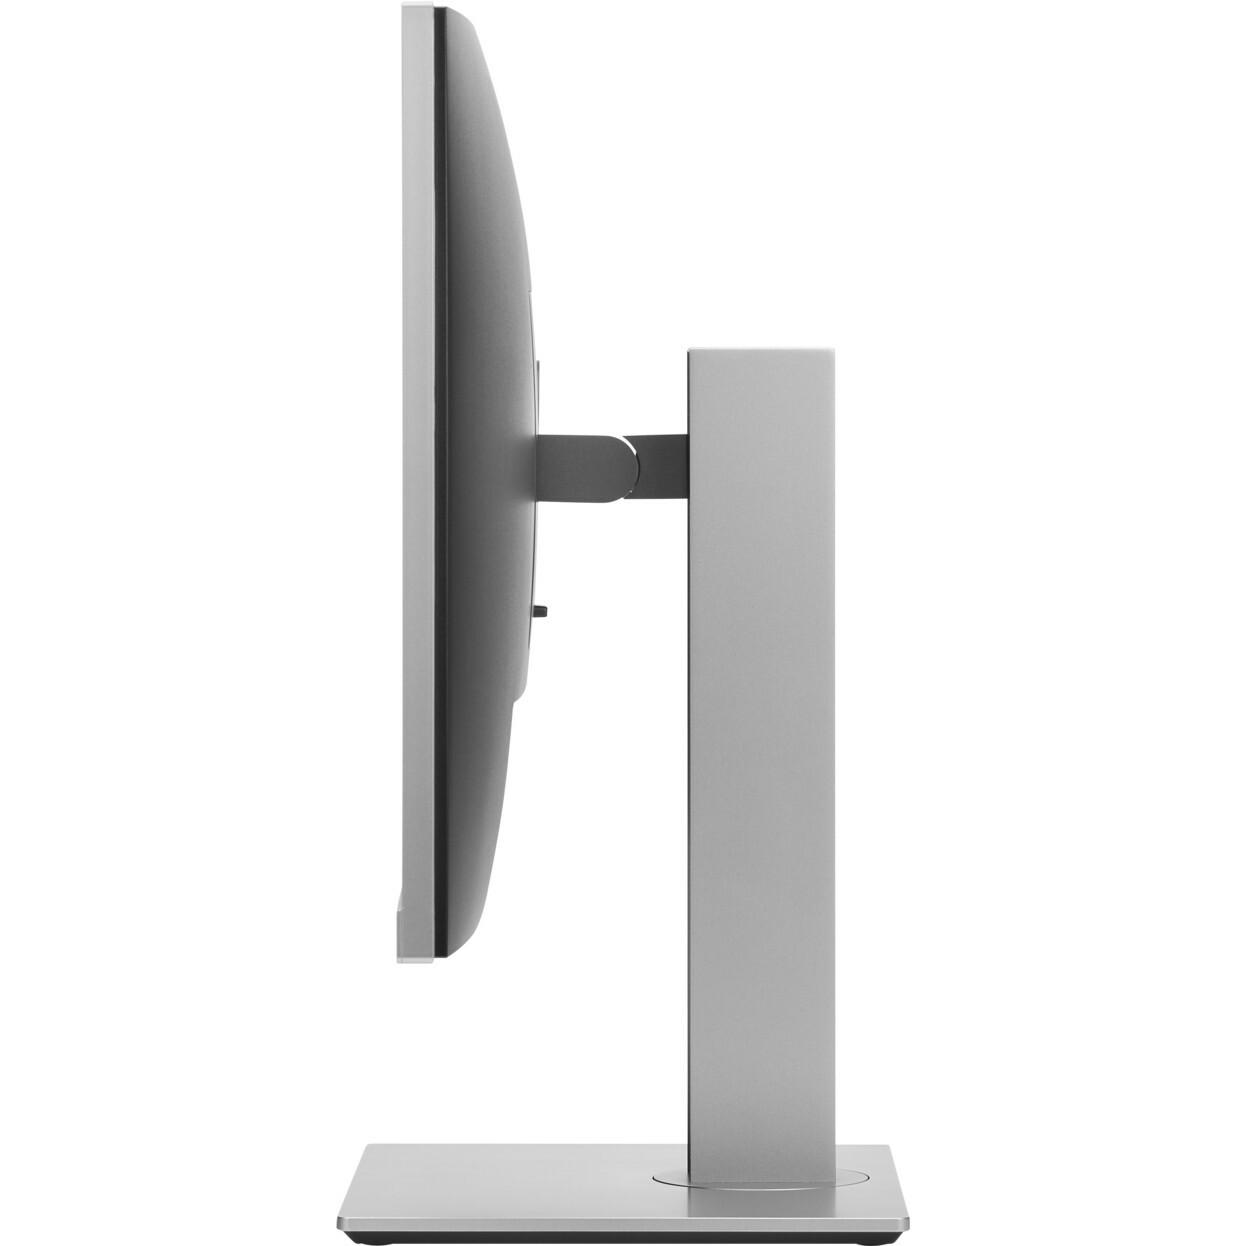 HP E243 60.5 cm 23.8And#34; LED LCD Monitor - 16:9 - 5 ms - 1920 x 1080 - 16.7 Million Colours - 250 cd/mAndamp;#178; - Full HD - HDMI - VGA - DisplayPort - USB - 38 W - EPEAT